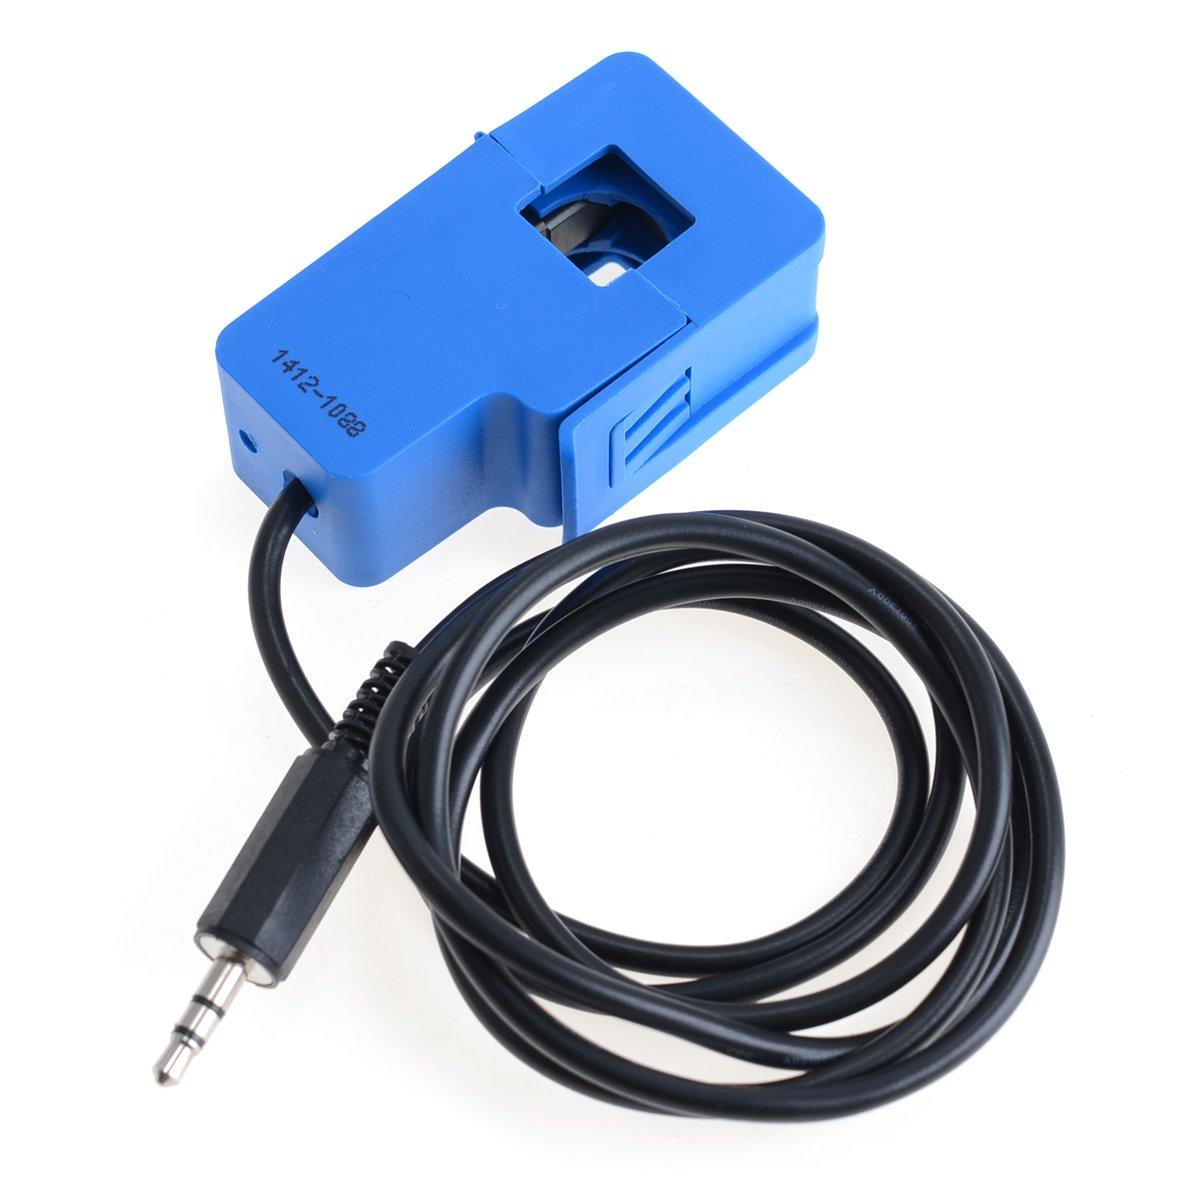 0~100A Non-invasive AC Current Sensor Split Core Current Transformer - Blue